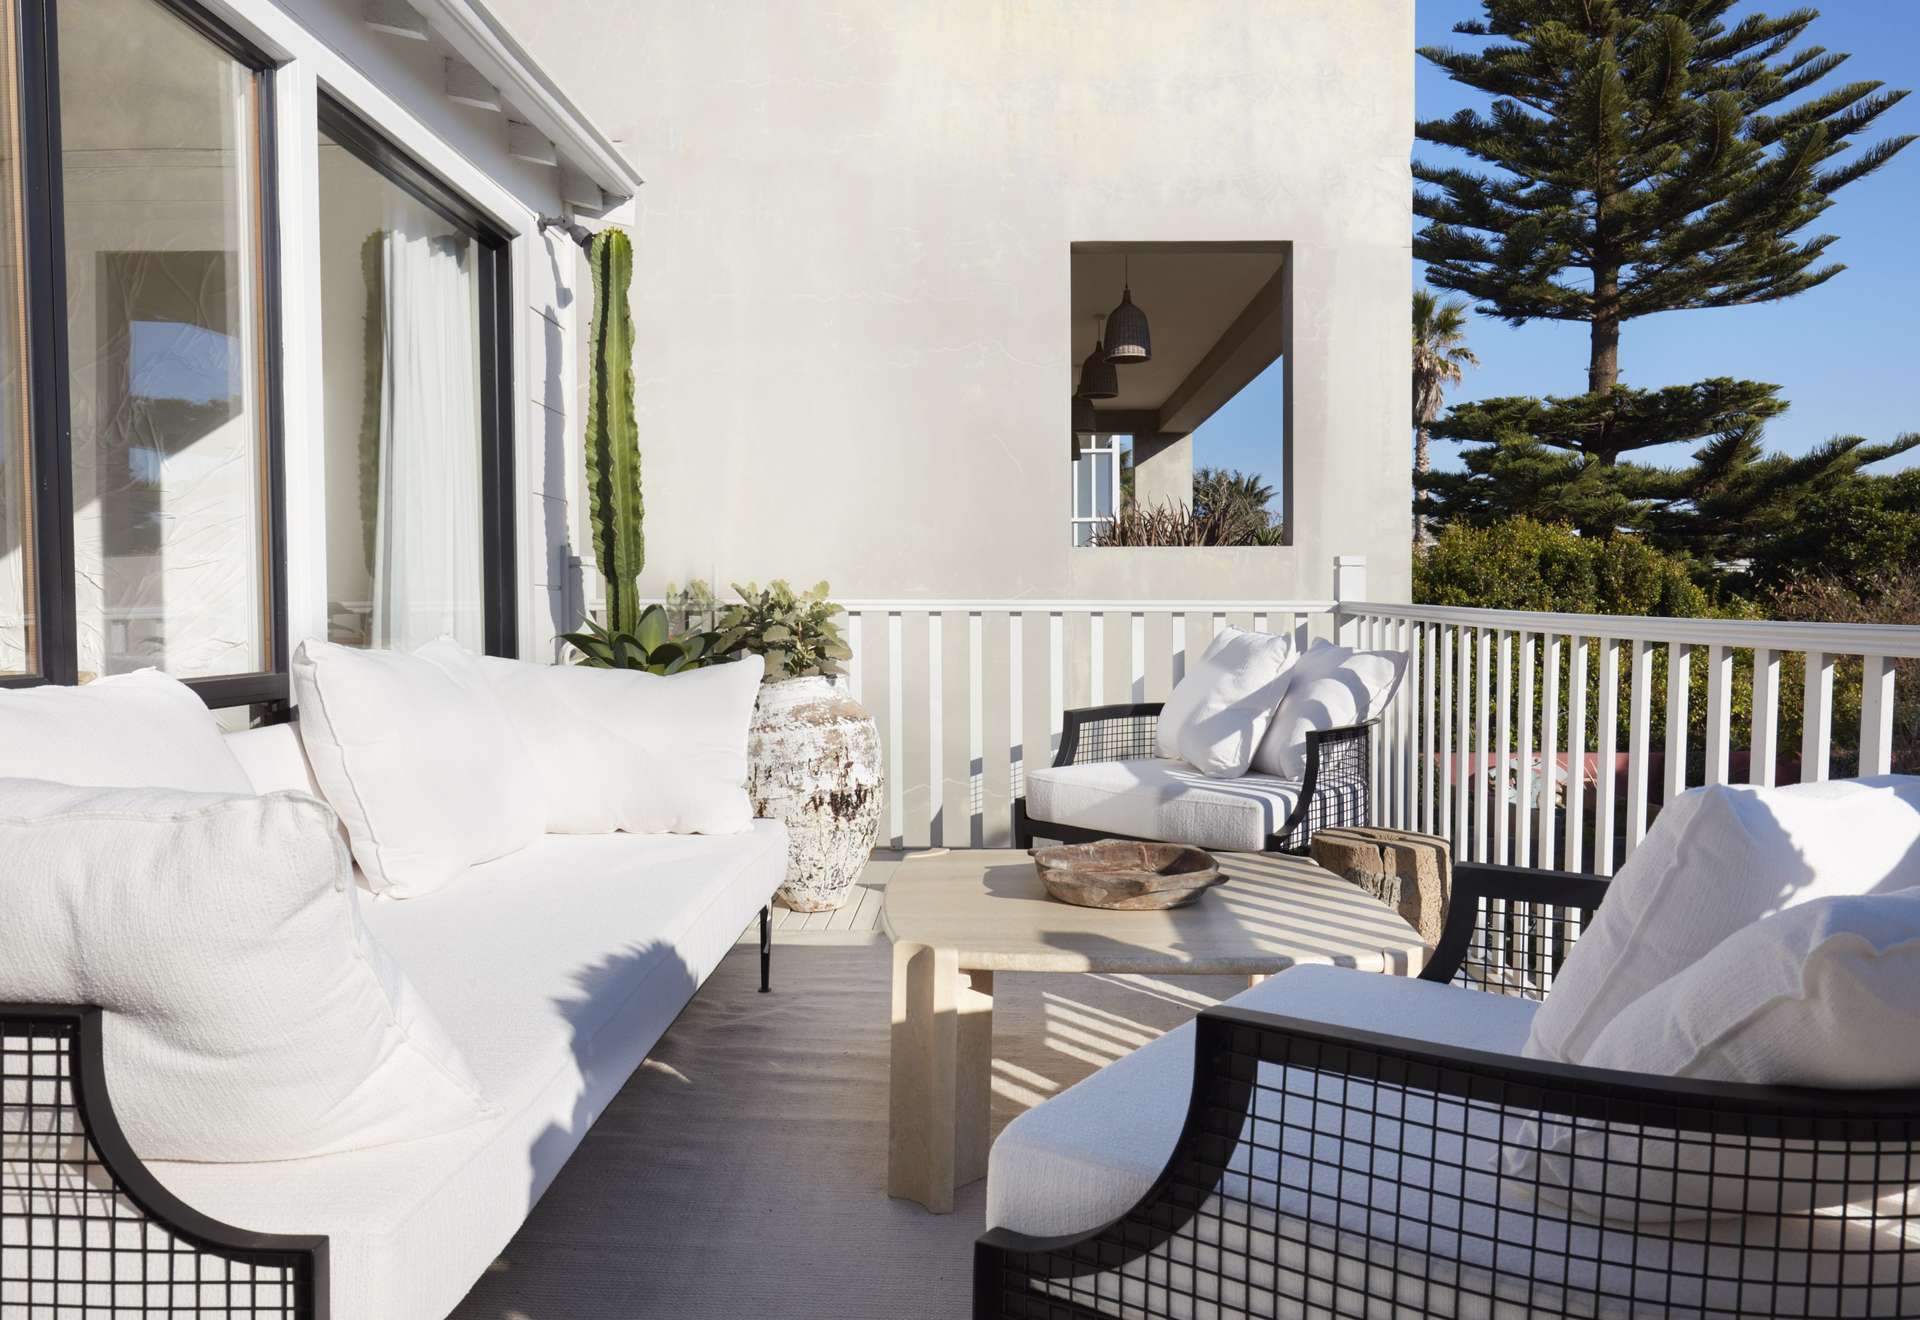 Oceania - Australia - New south wales area - Sydney area - Seavue - Image 1/21